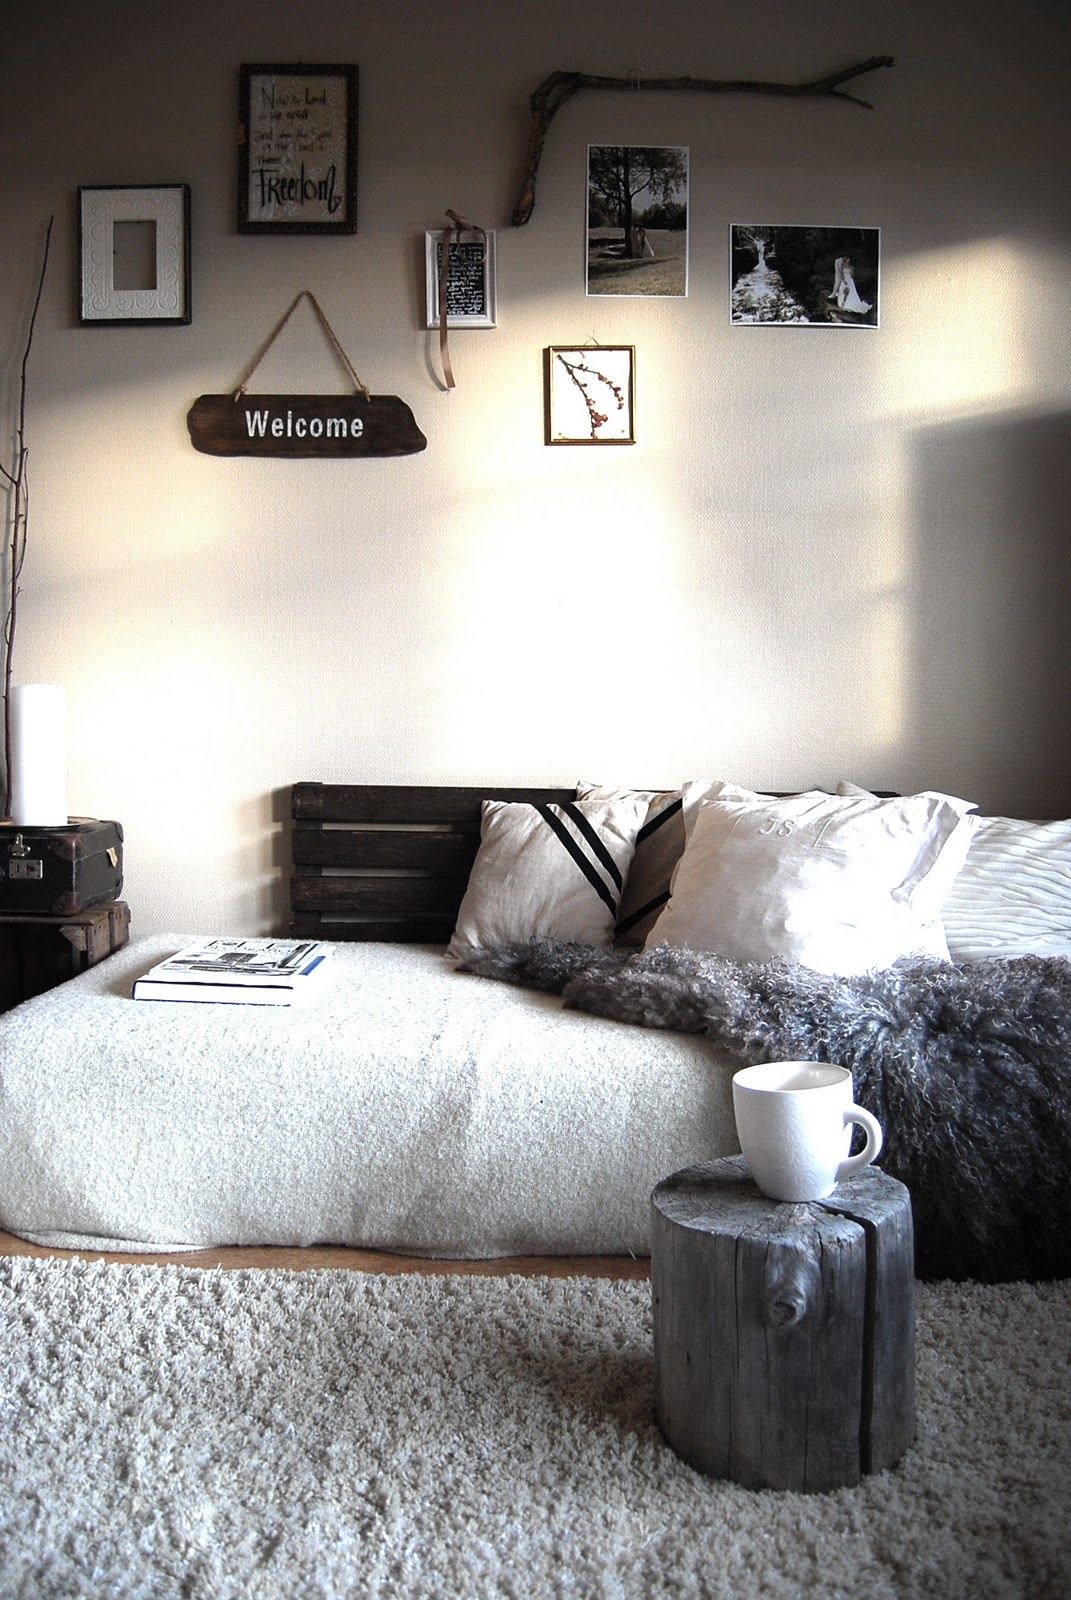 Eldrids min kosekrok for Floor mattress bed ideas